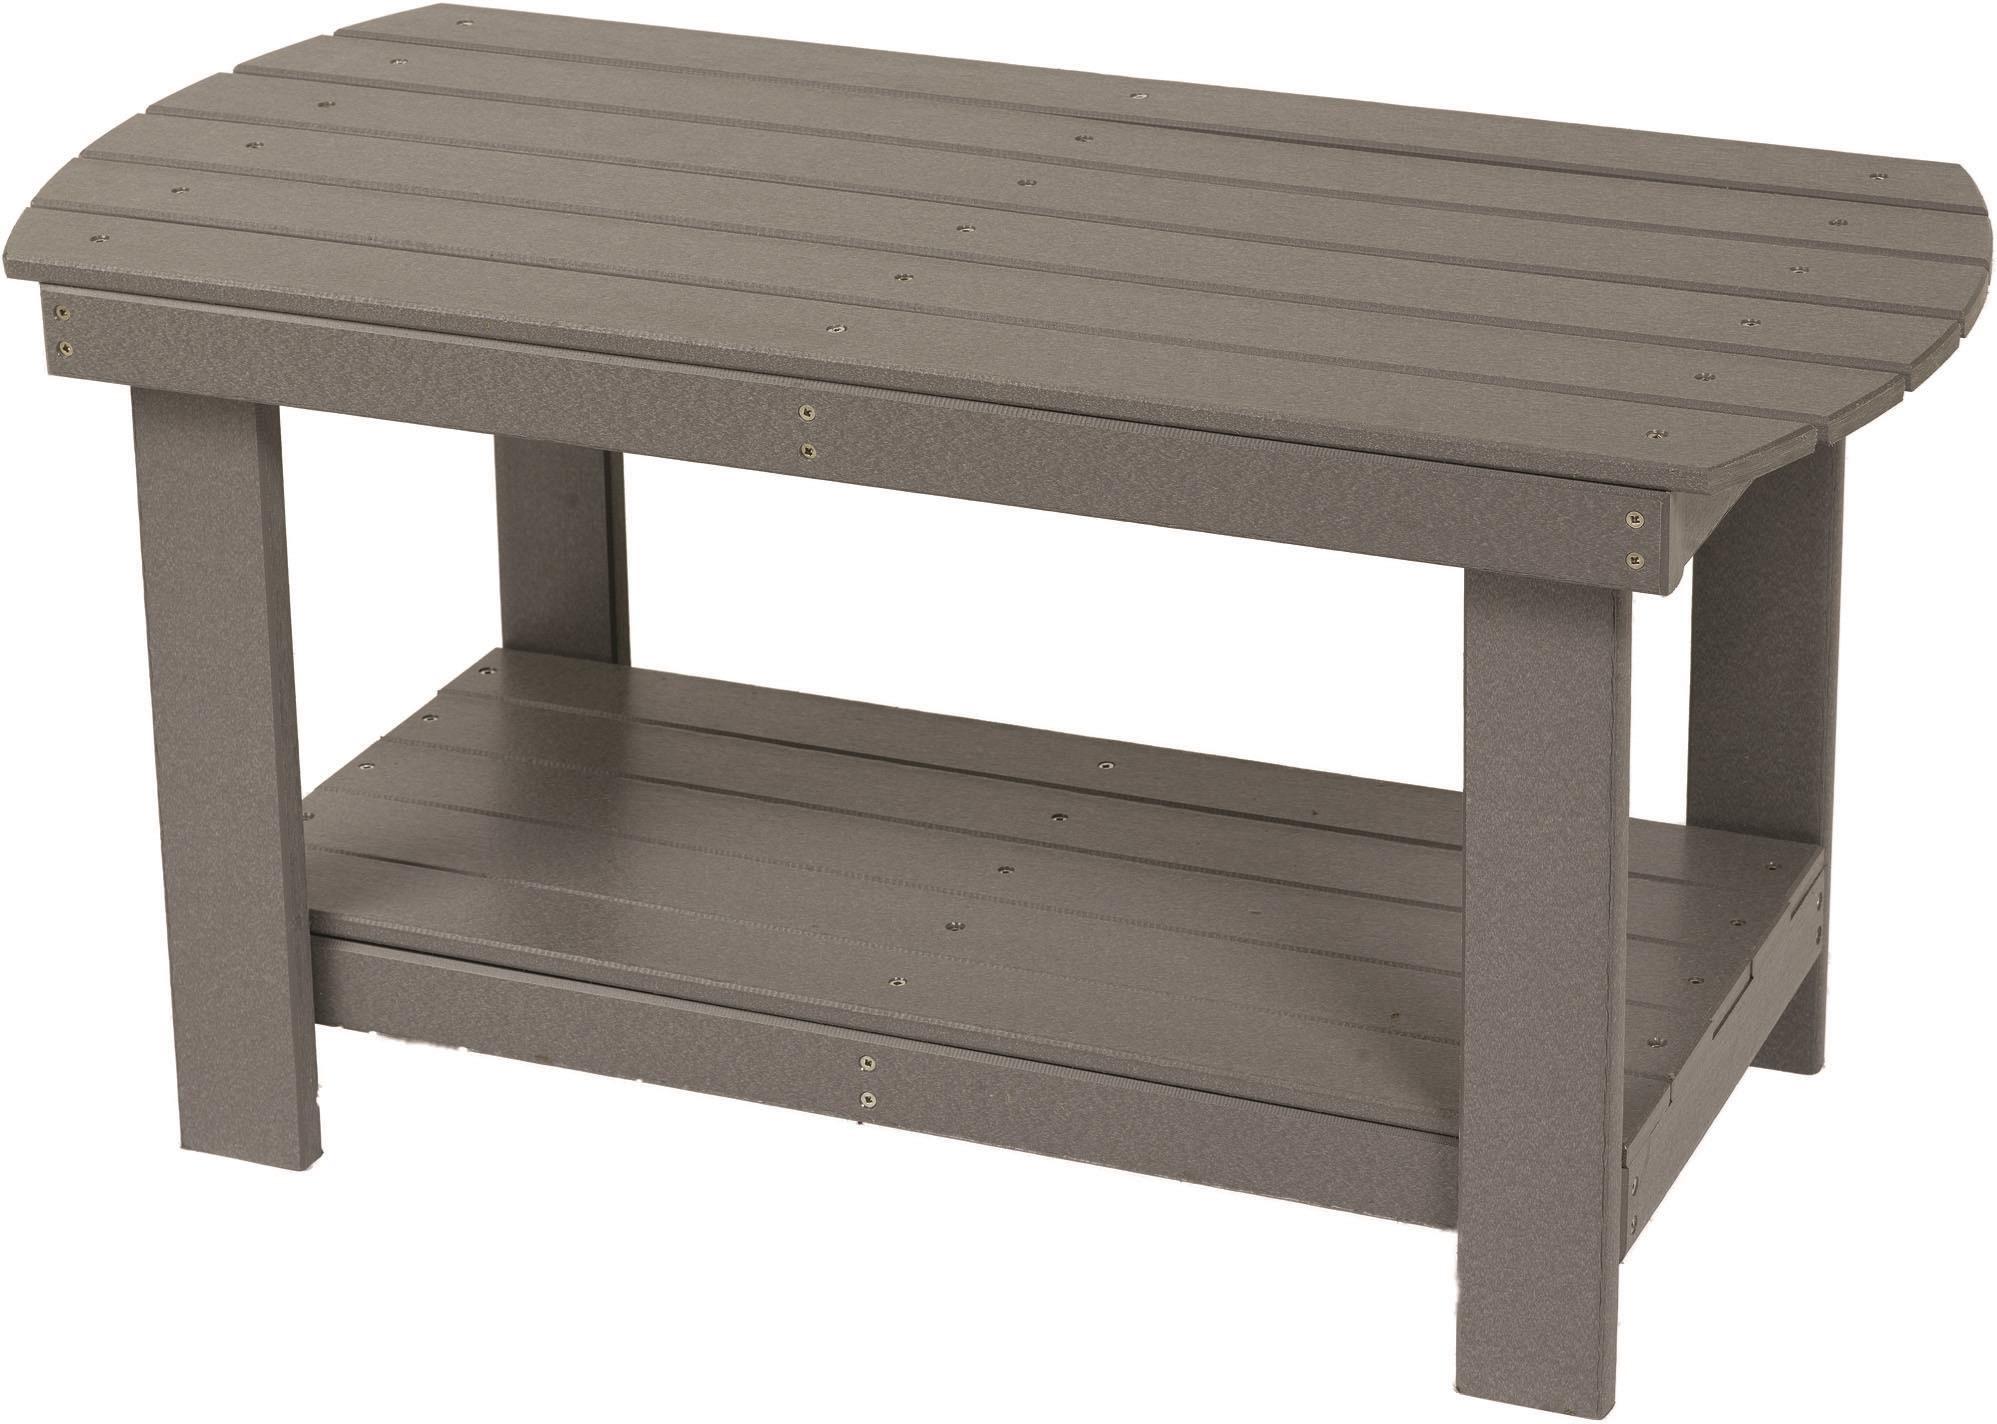 Backyard Designs Adirondack Coffee Table Westrich Furniture in dimensions 1997 X 1424